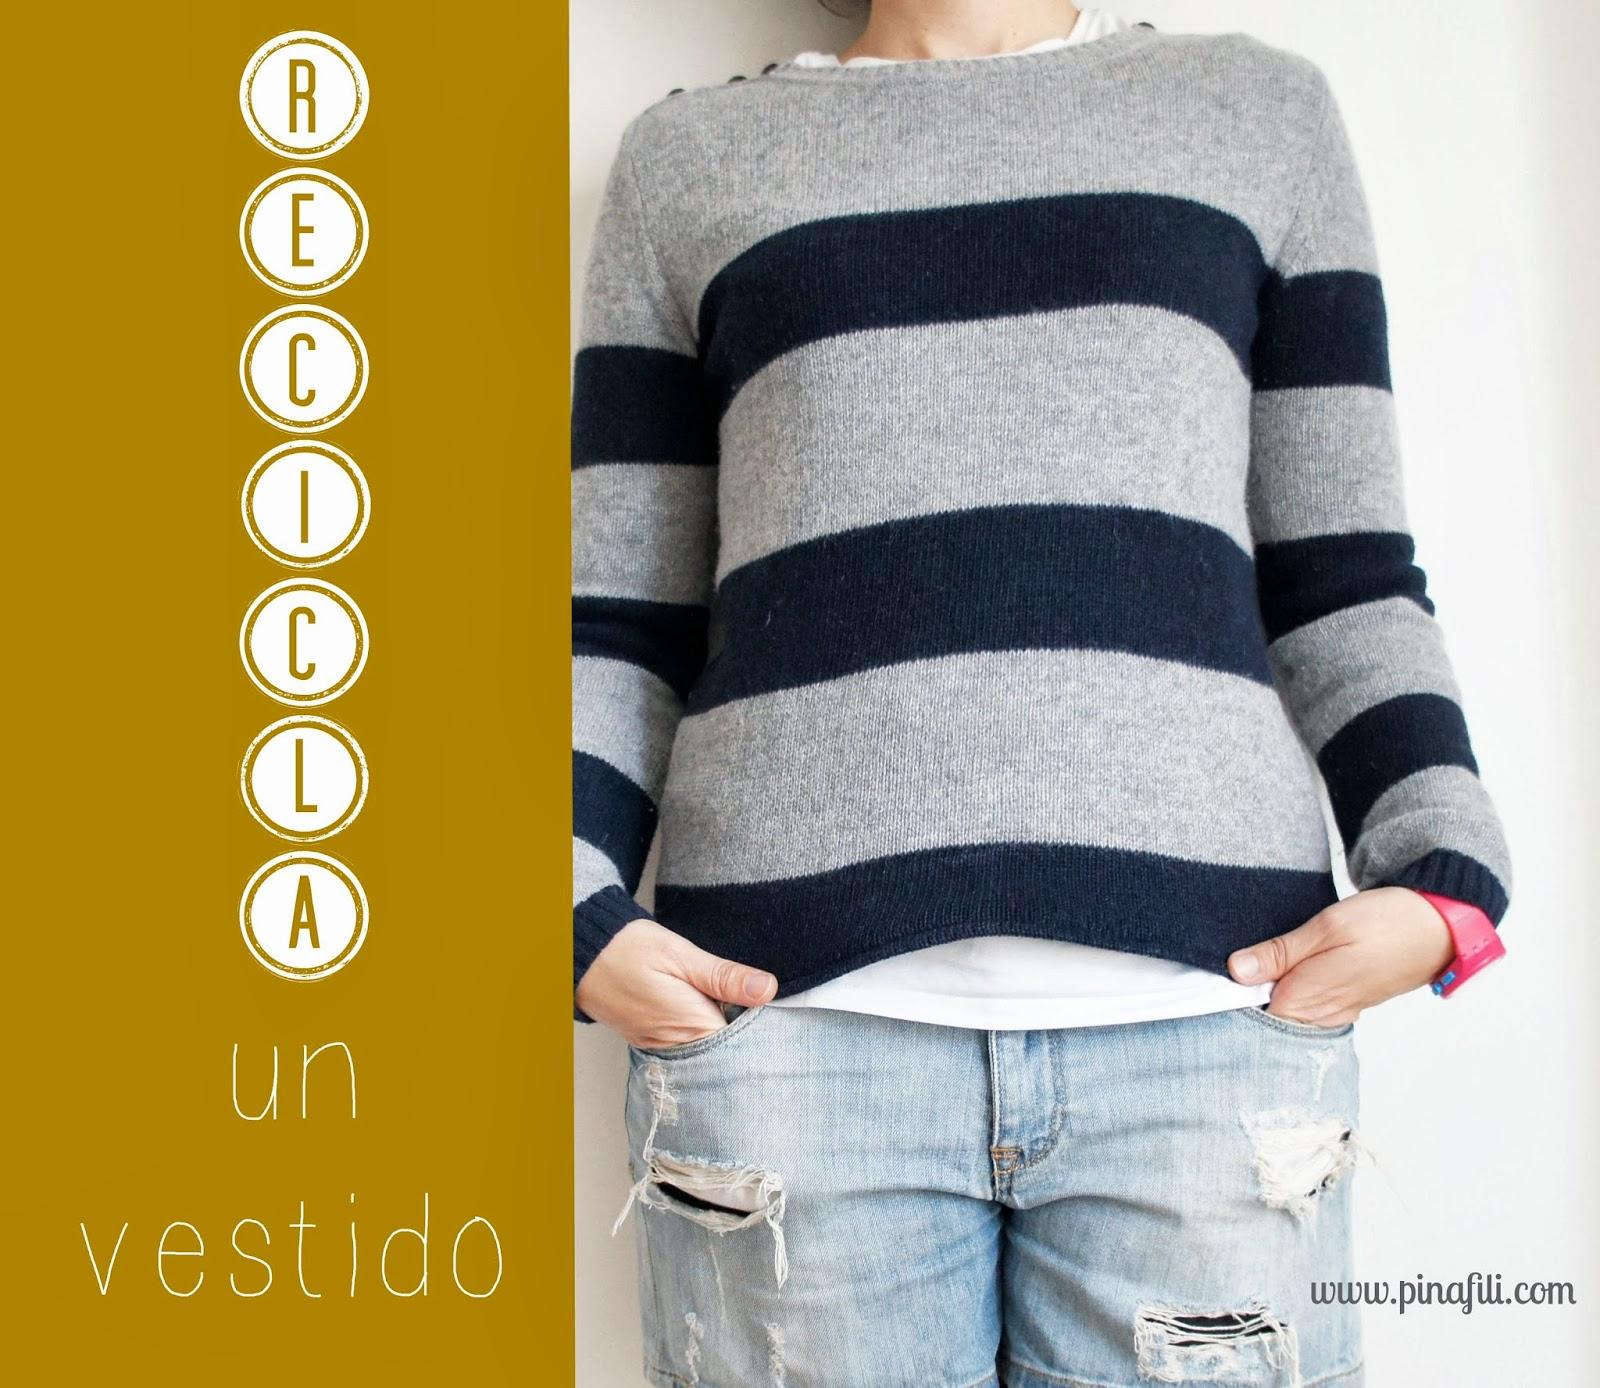 Pinafili video recicla tu ropa de vestido de lana a jersey - Reciclar restos de lana ...